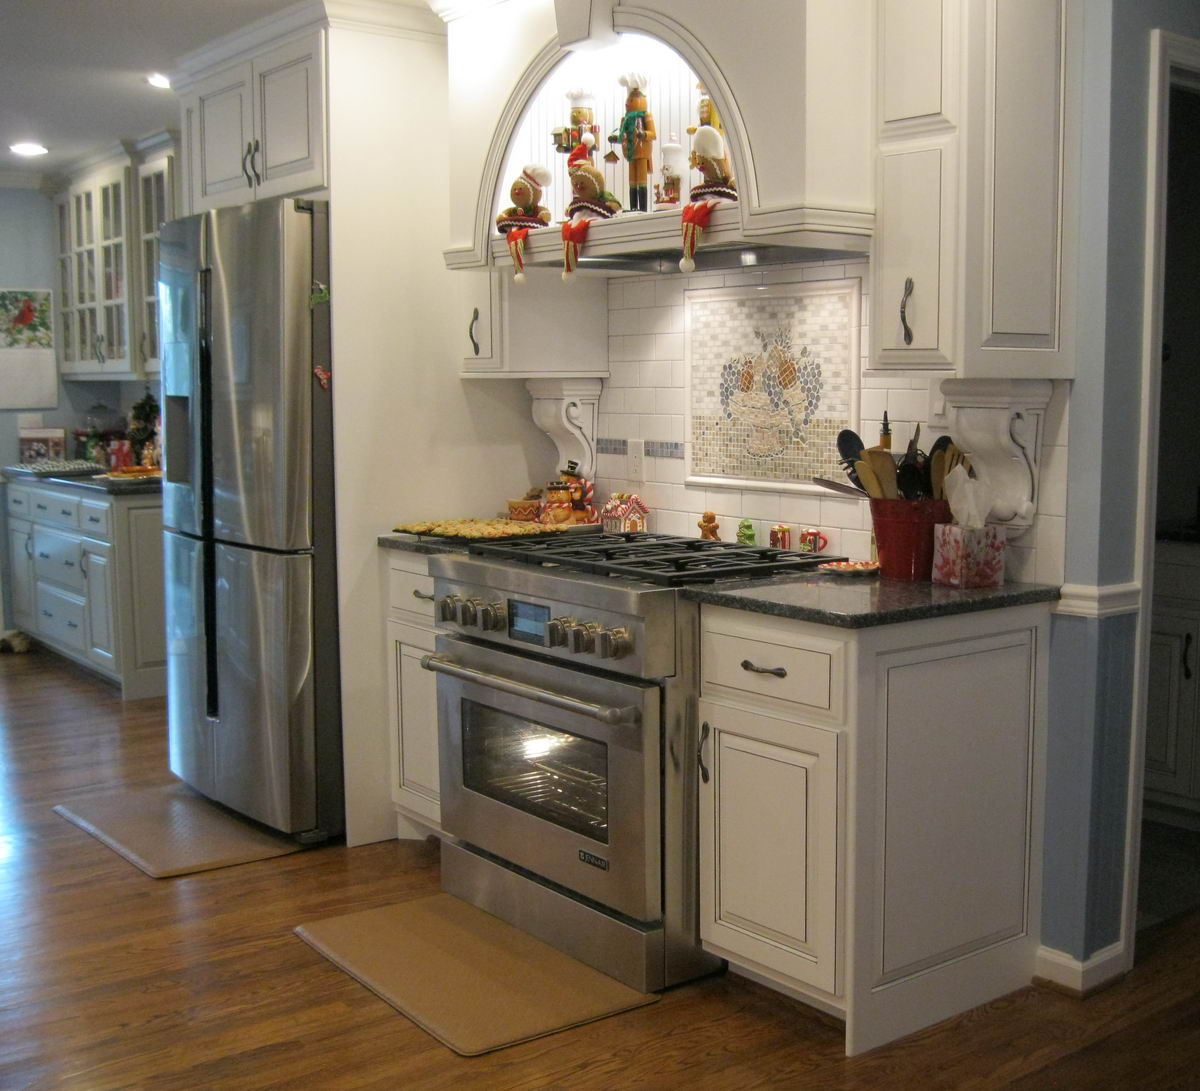 voss.kitchen.fullview